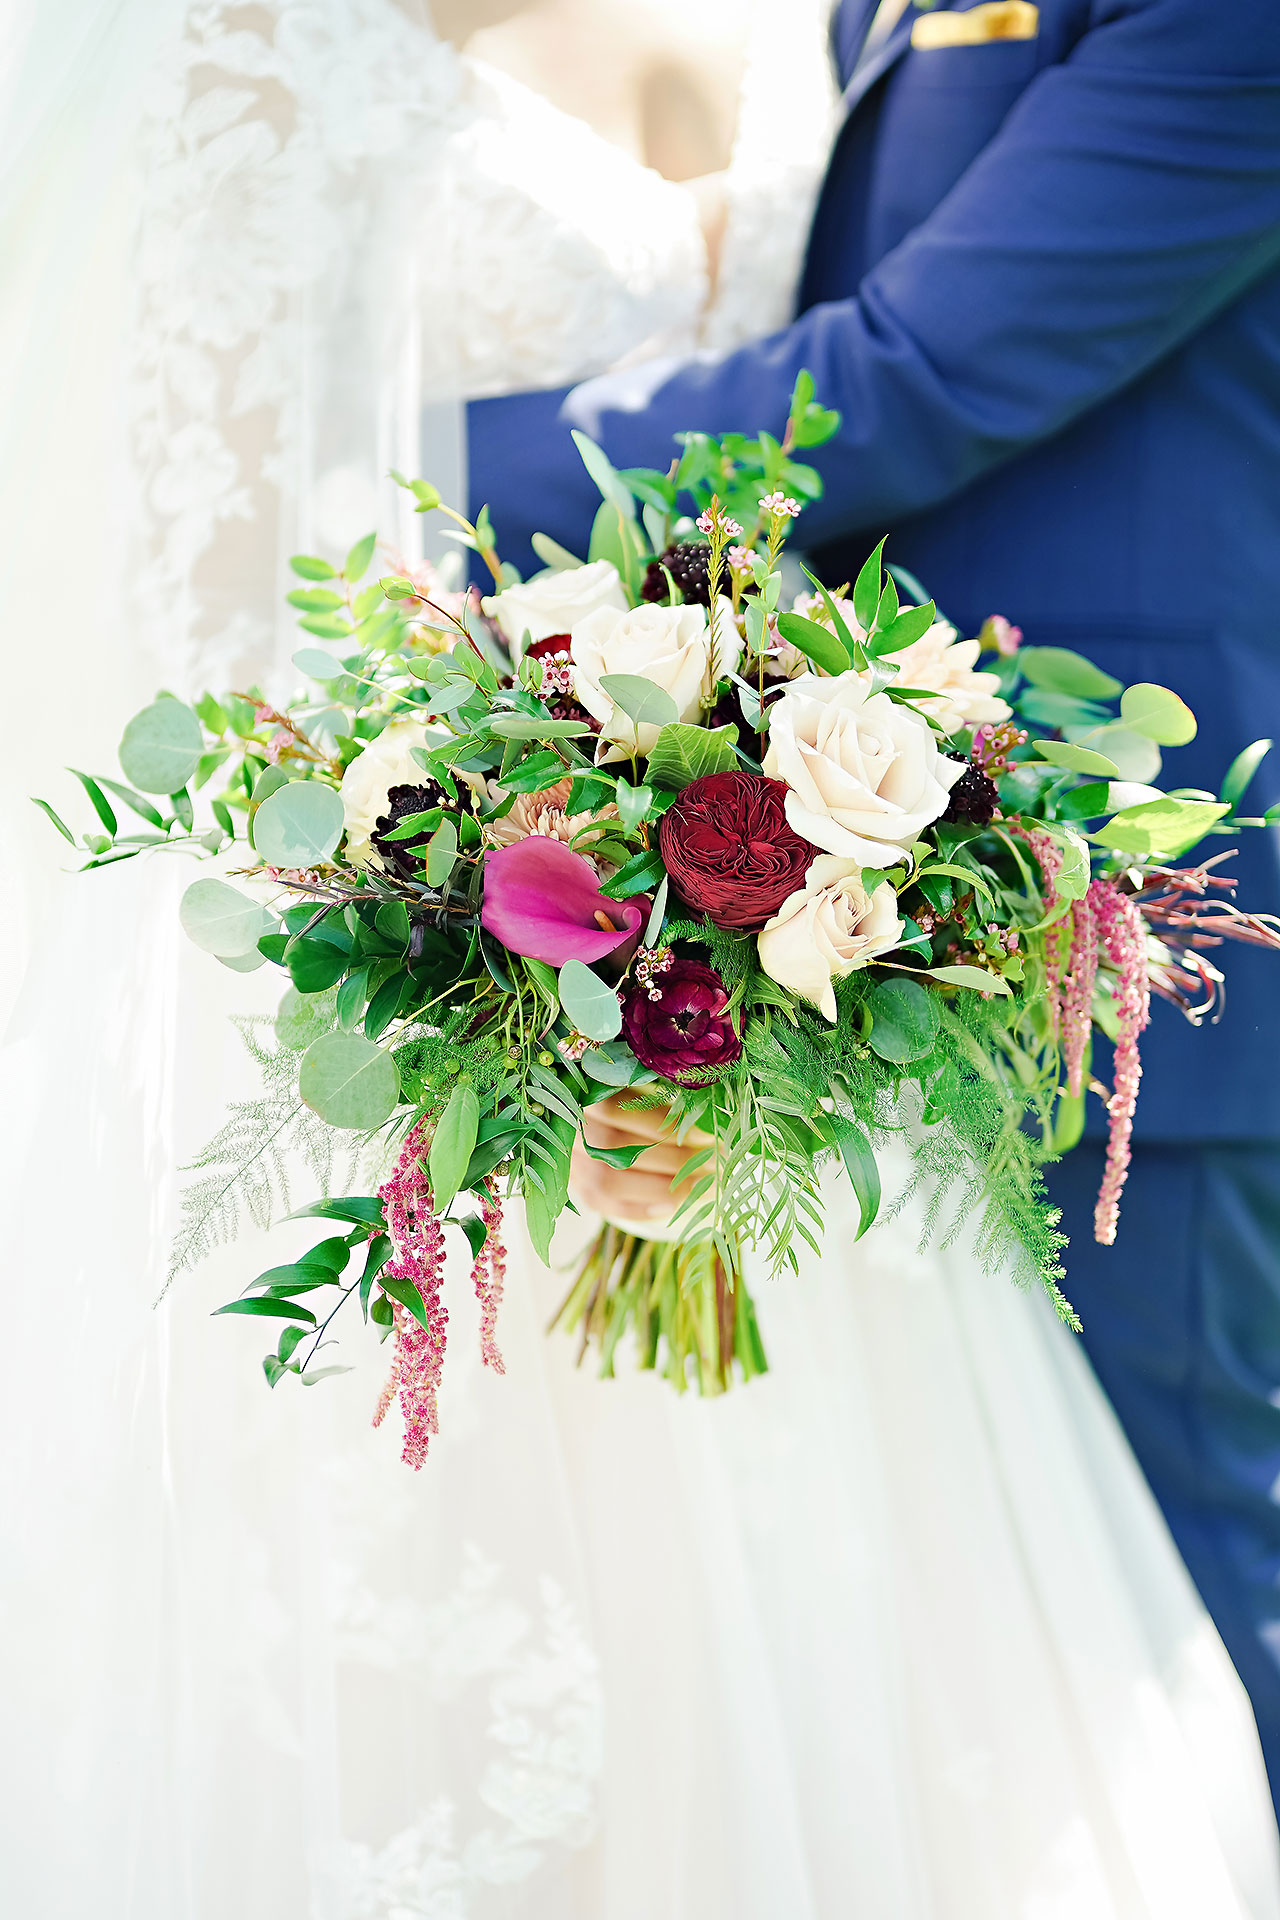 Nadia Parker Black Iris Estate Carmel Indiana Wedding May 2021 064